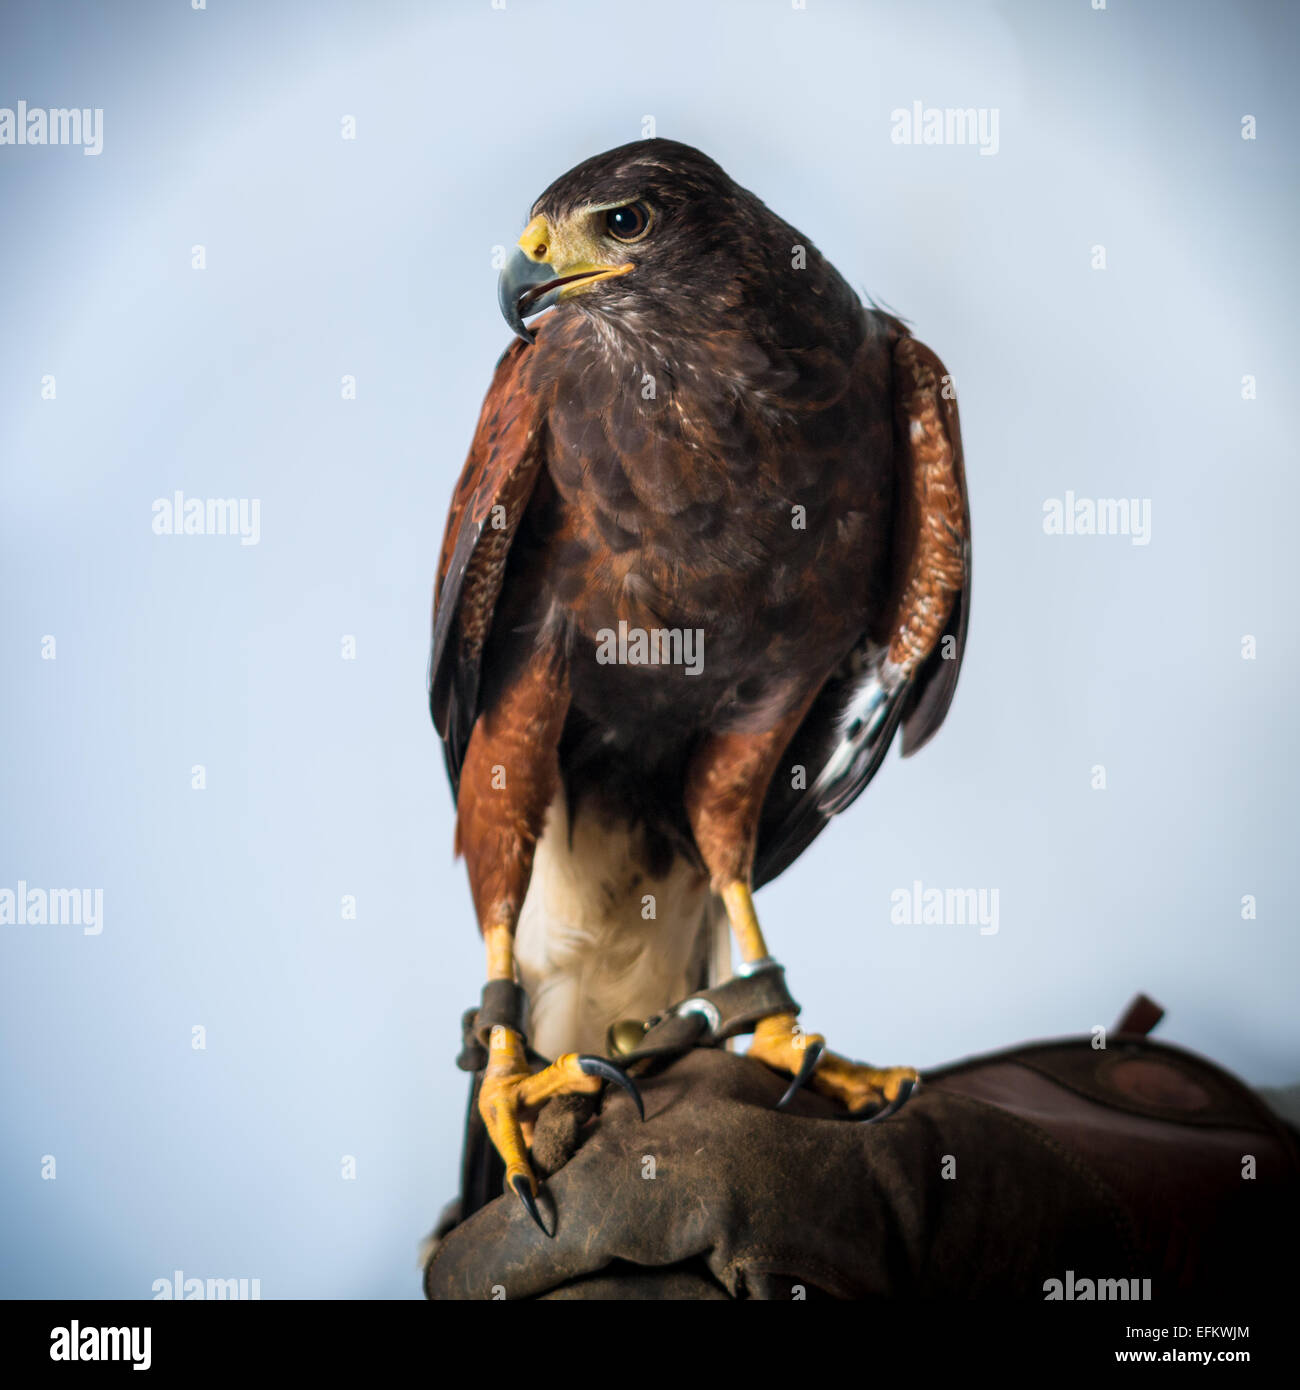 acute altitude beak big bird brown buzzard claws danger dangerous eye high hunter vision yellow - Stock Image